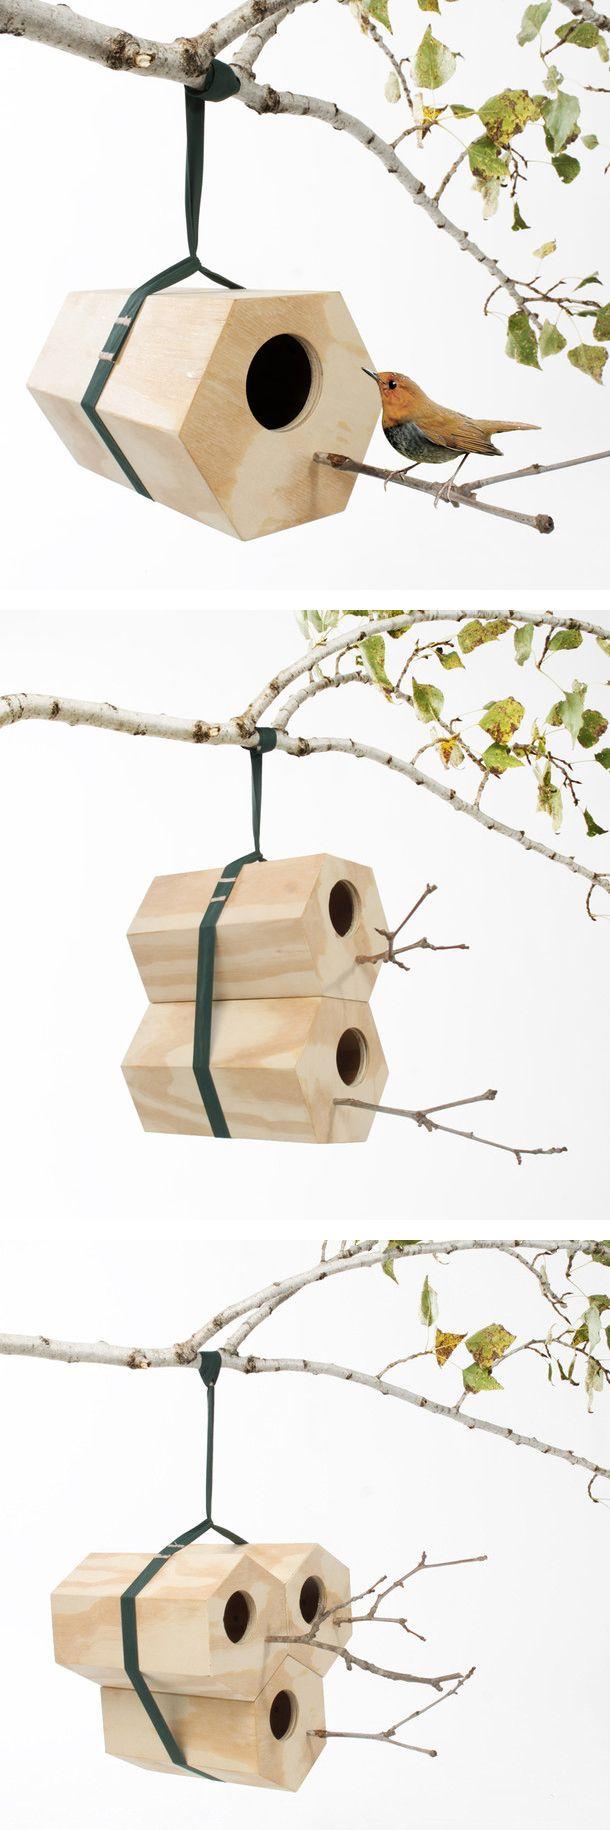 Handmade modular bird house birds nest #product_design